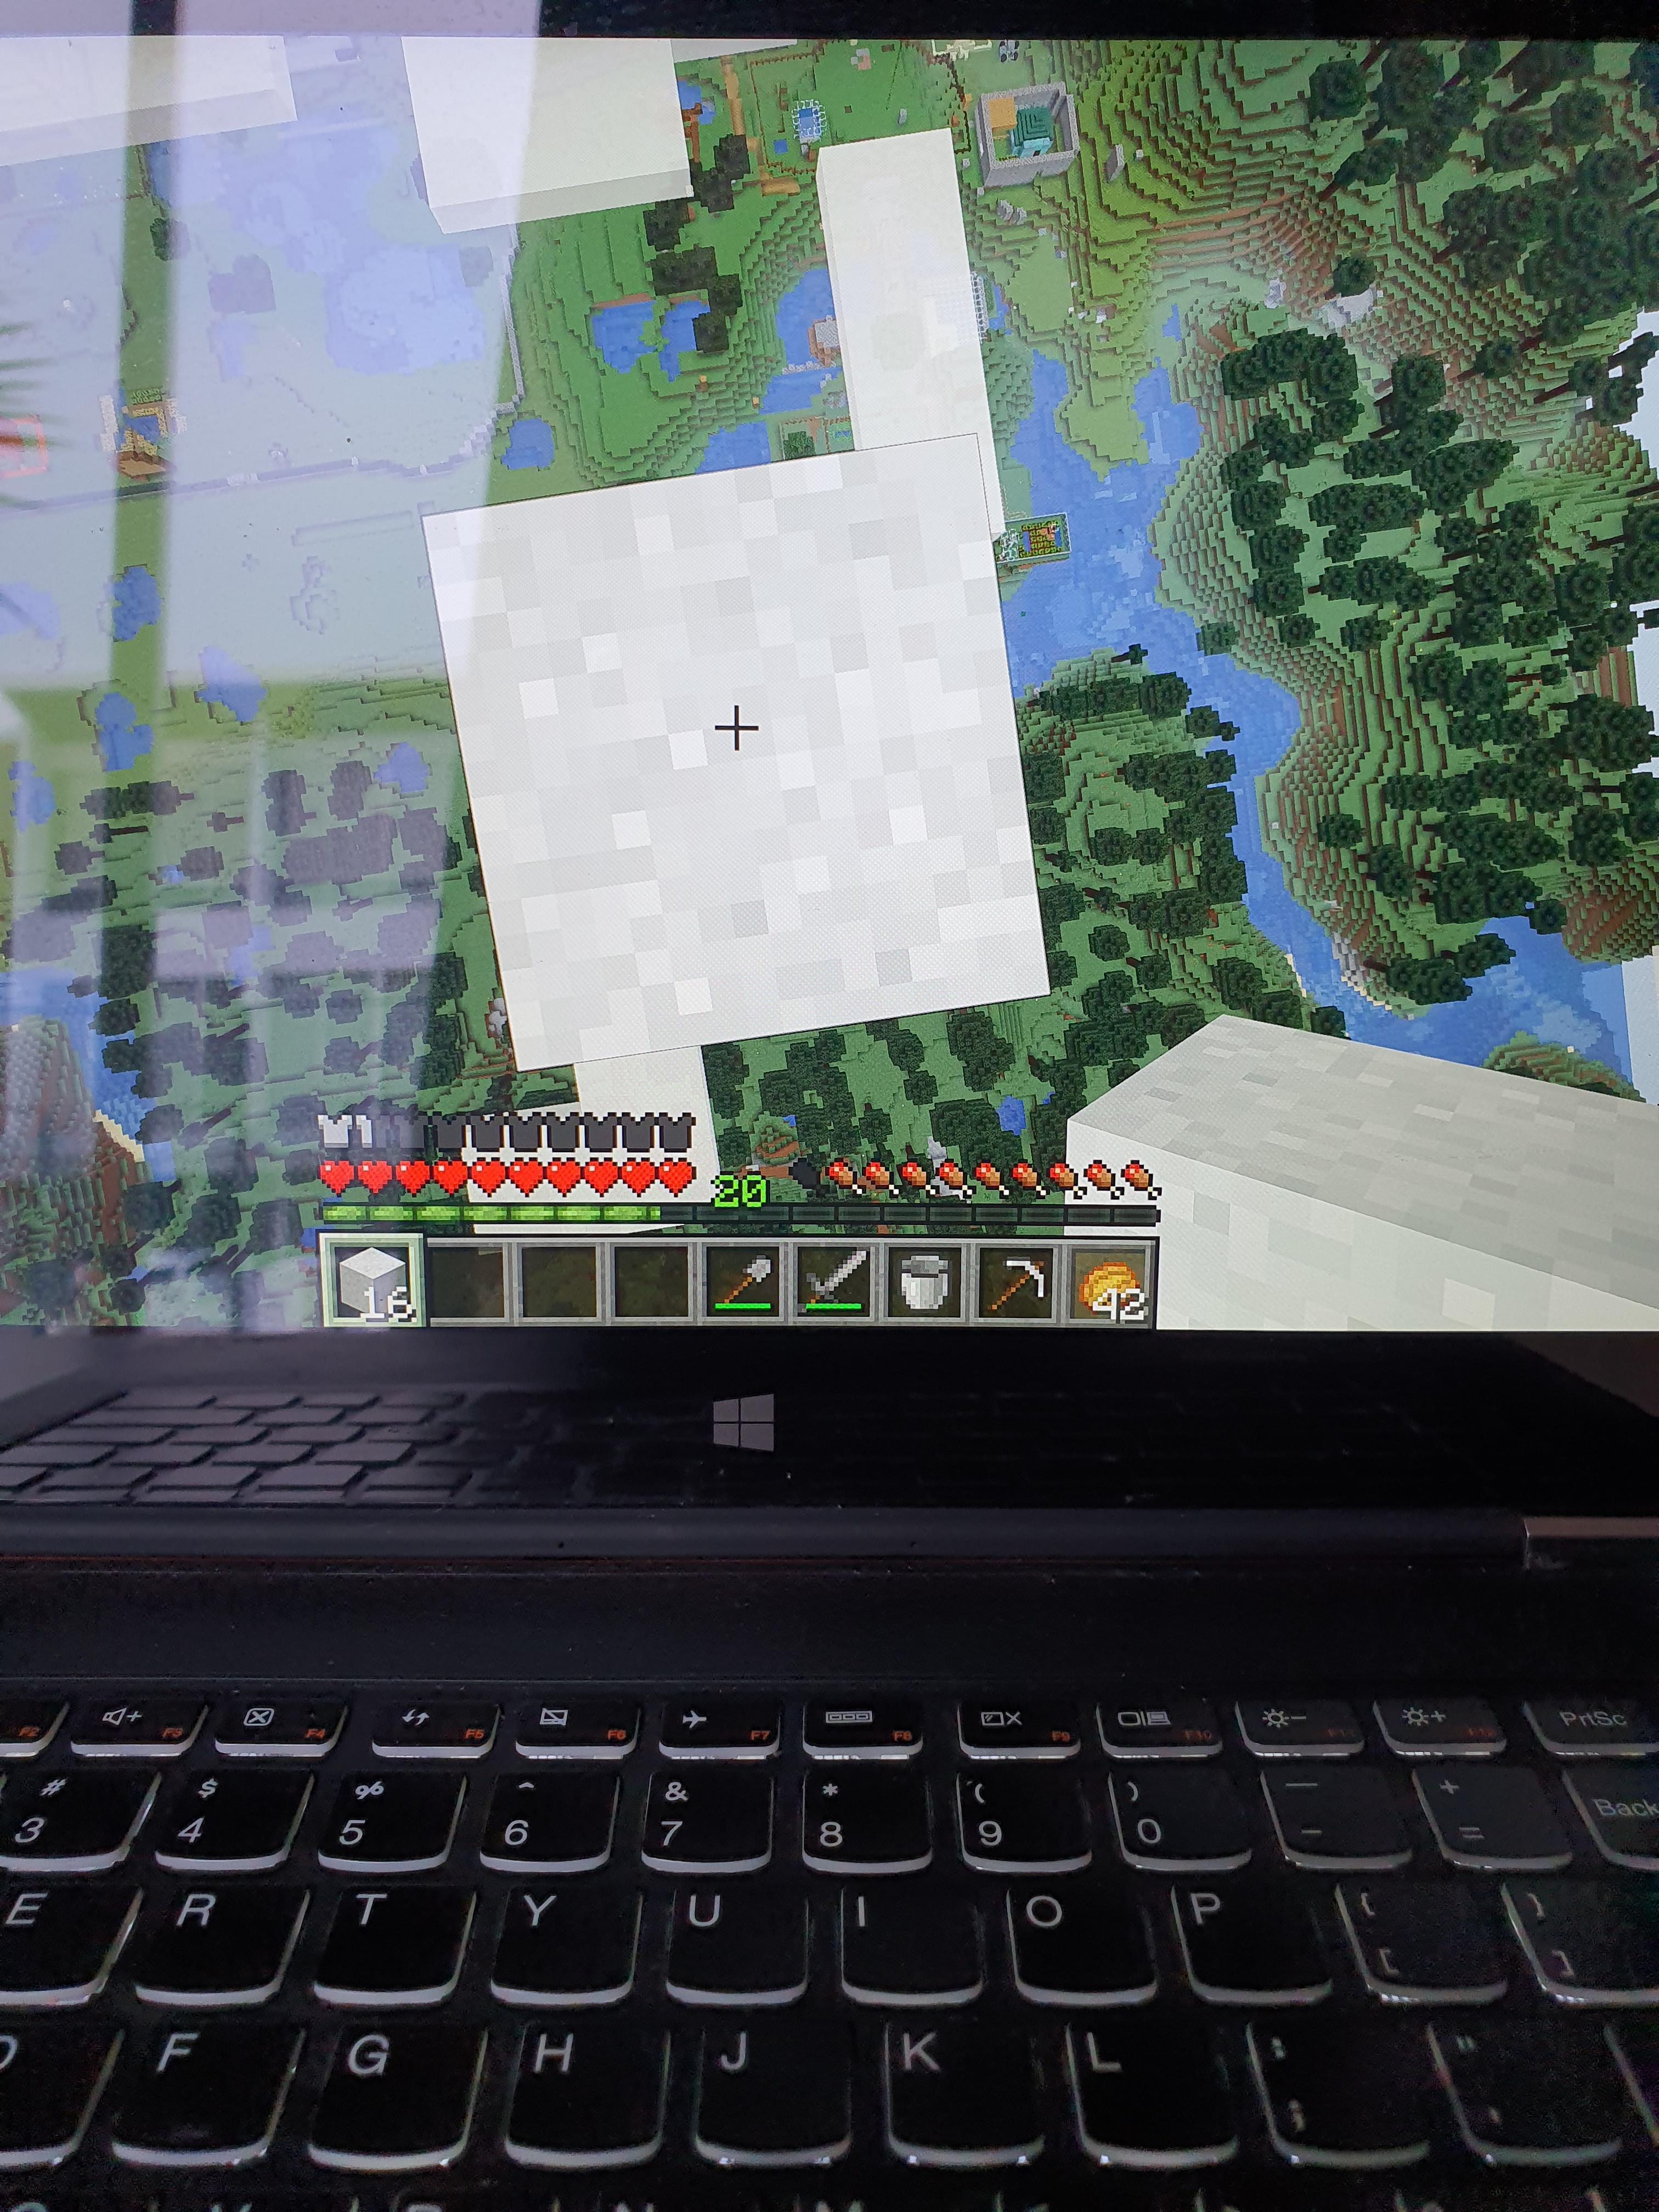 How To Fill A Bucket In Minecraft : bucket, minecraft, Moment, Stacks, Concrete, Powder, Realize, Forgot, Bucket., Minecraft